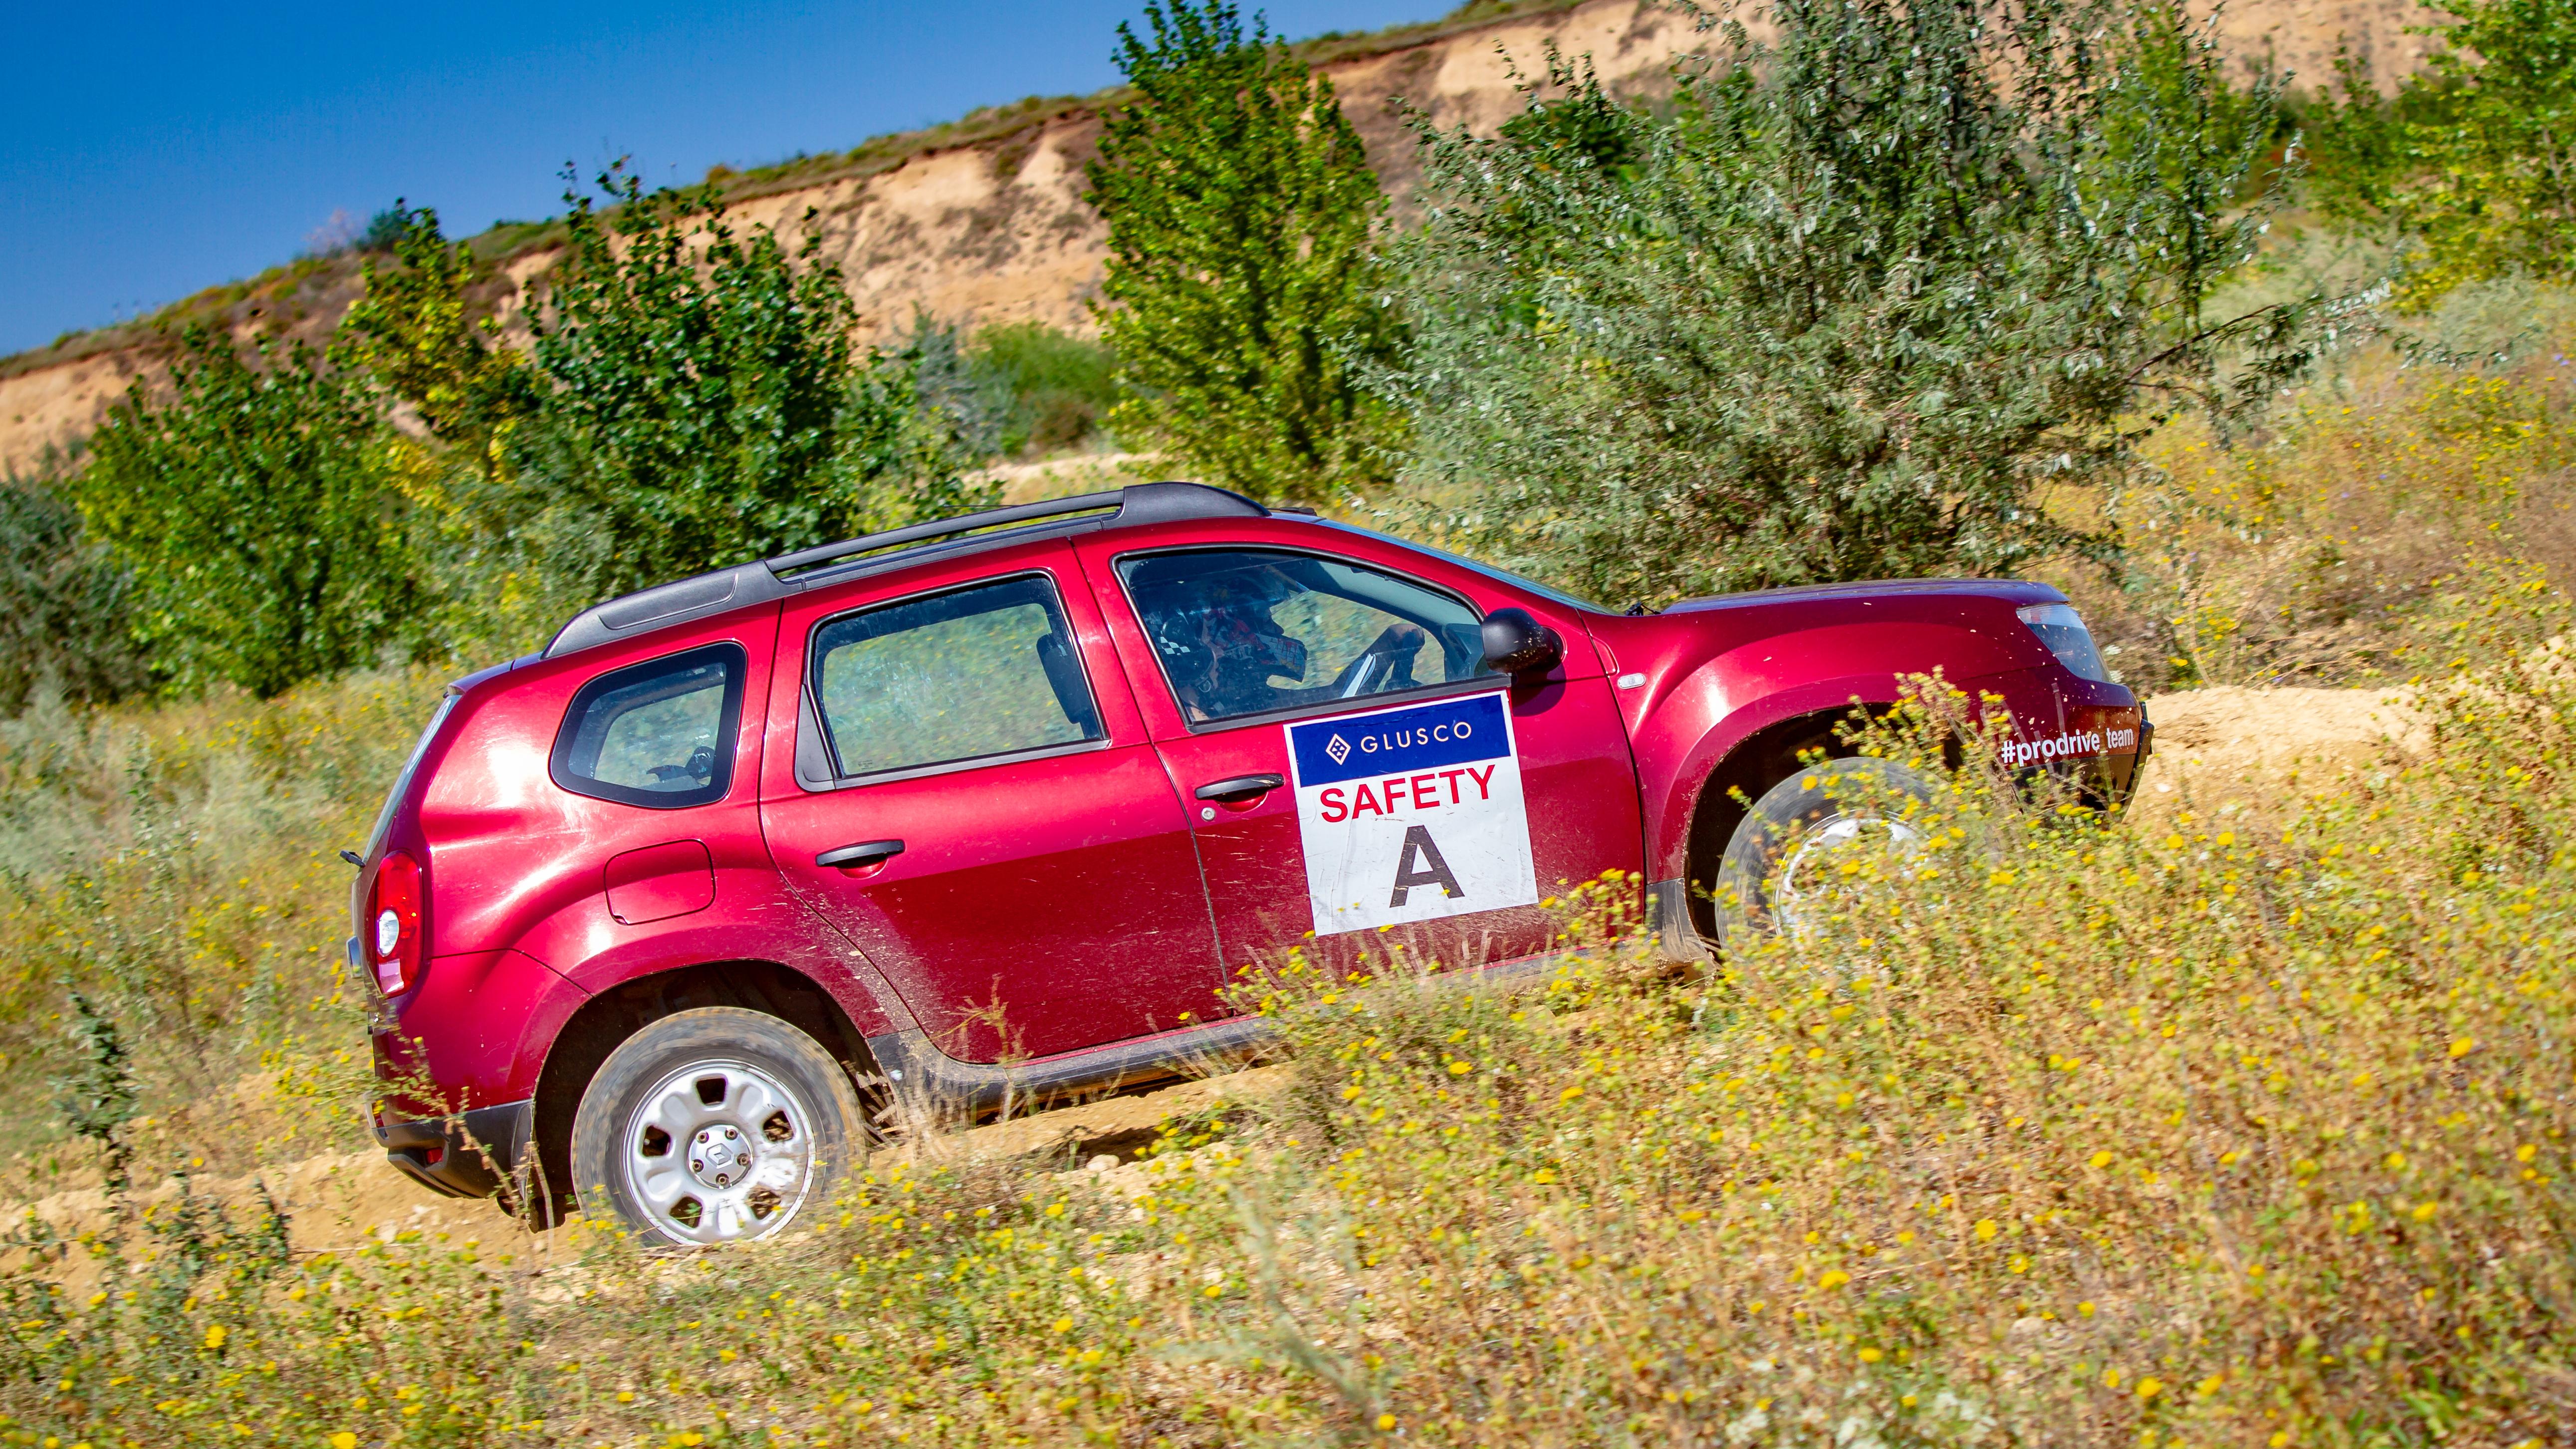 Водитель: Сероклин Карина<br/>Штурман: Данилова Ольга<br/>Машина: Renault Duster (2014г., 1461см³)<br/>Класс: N4